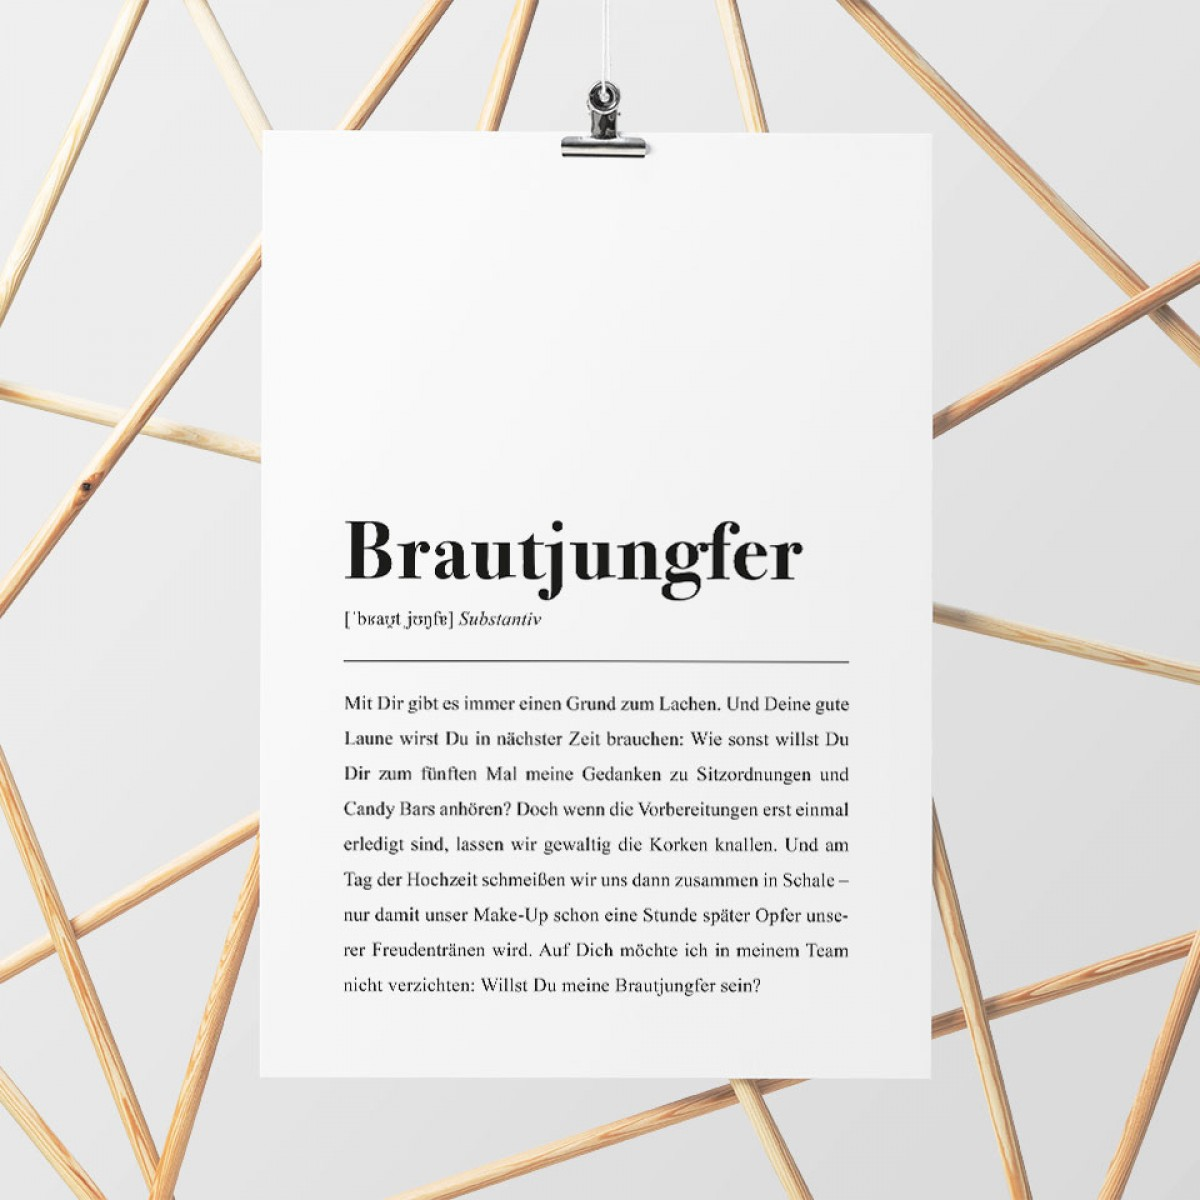 Brautjungfer Definition: DIN A4 Poster - Pulse of Art